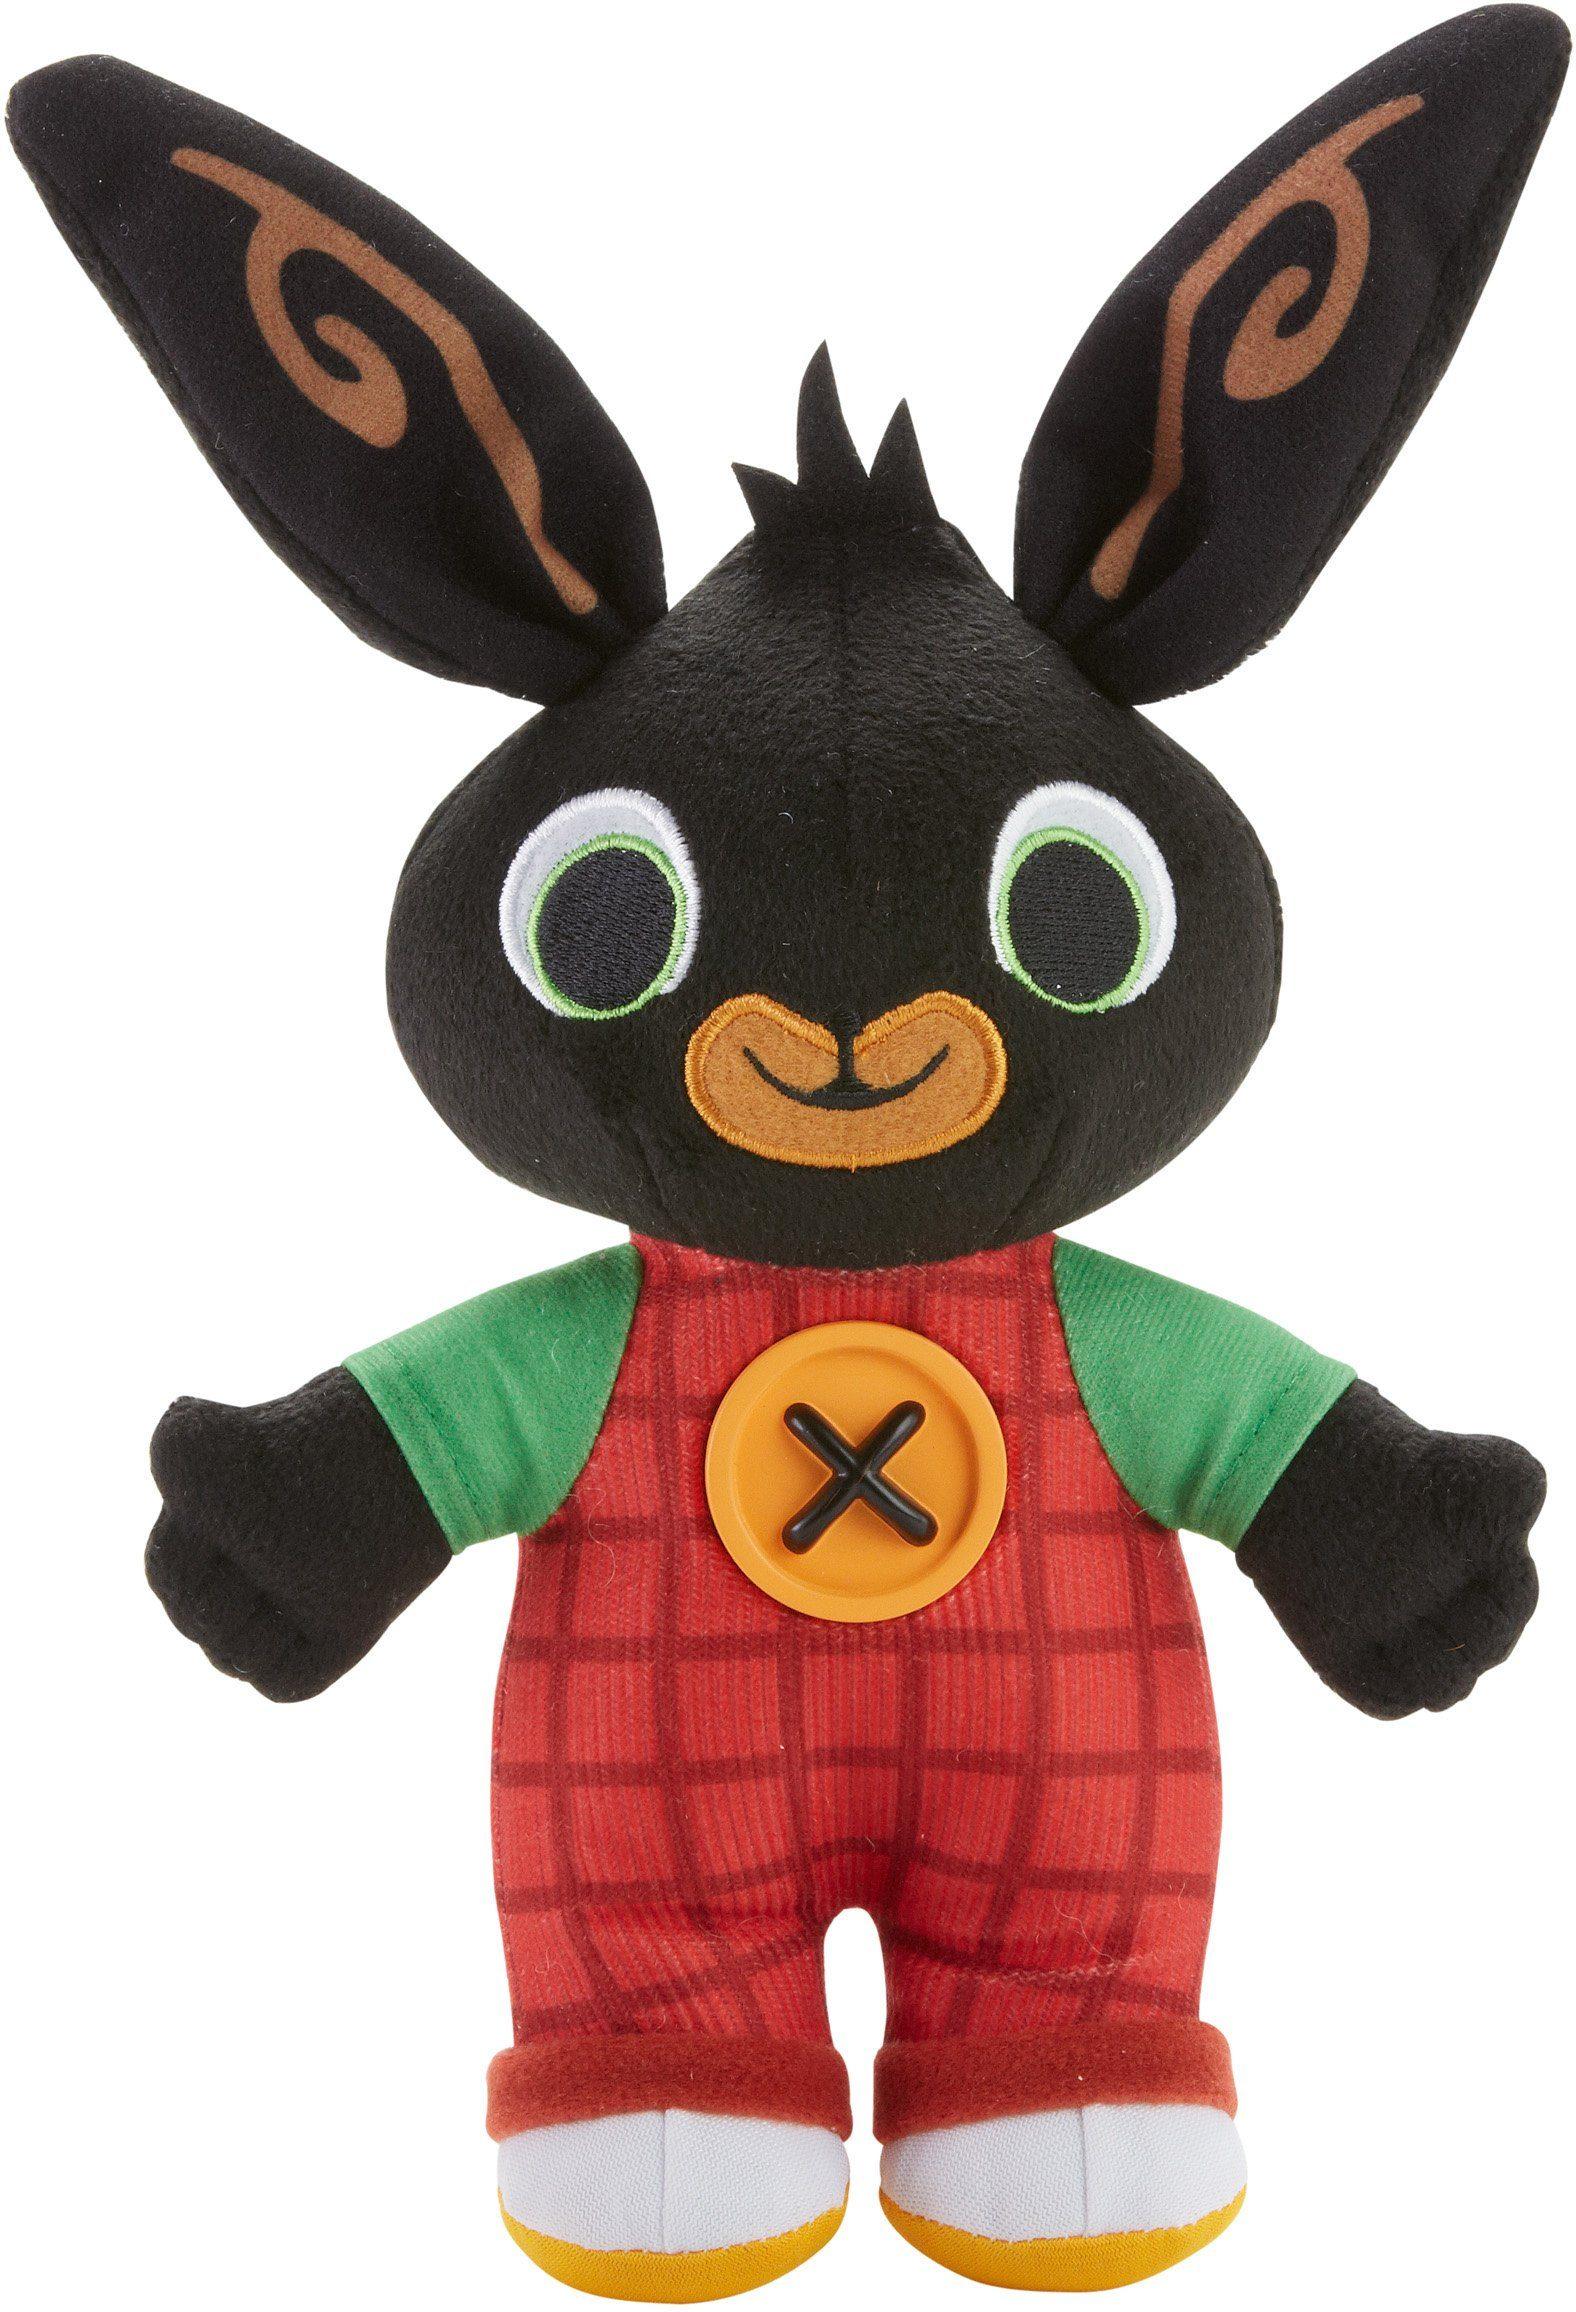 Fisher Price Stofftier Hase, ca. 18 cm, »Bing Bunny™ Bing«